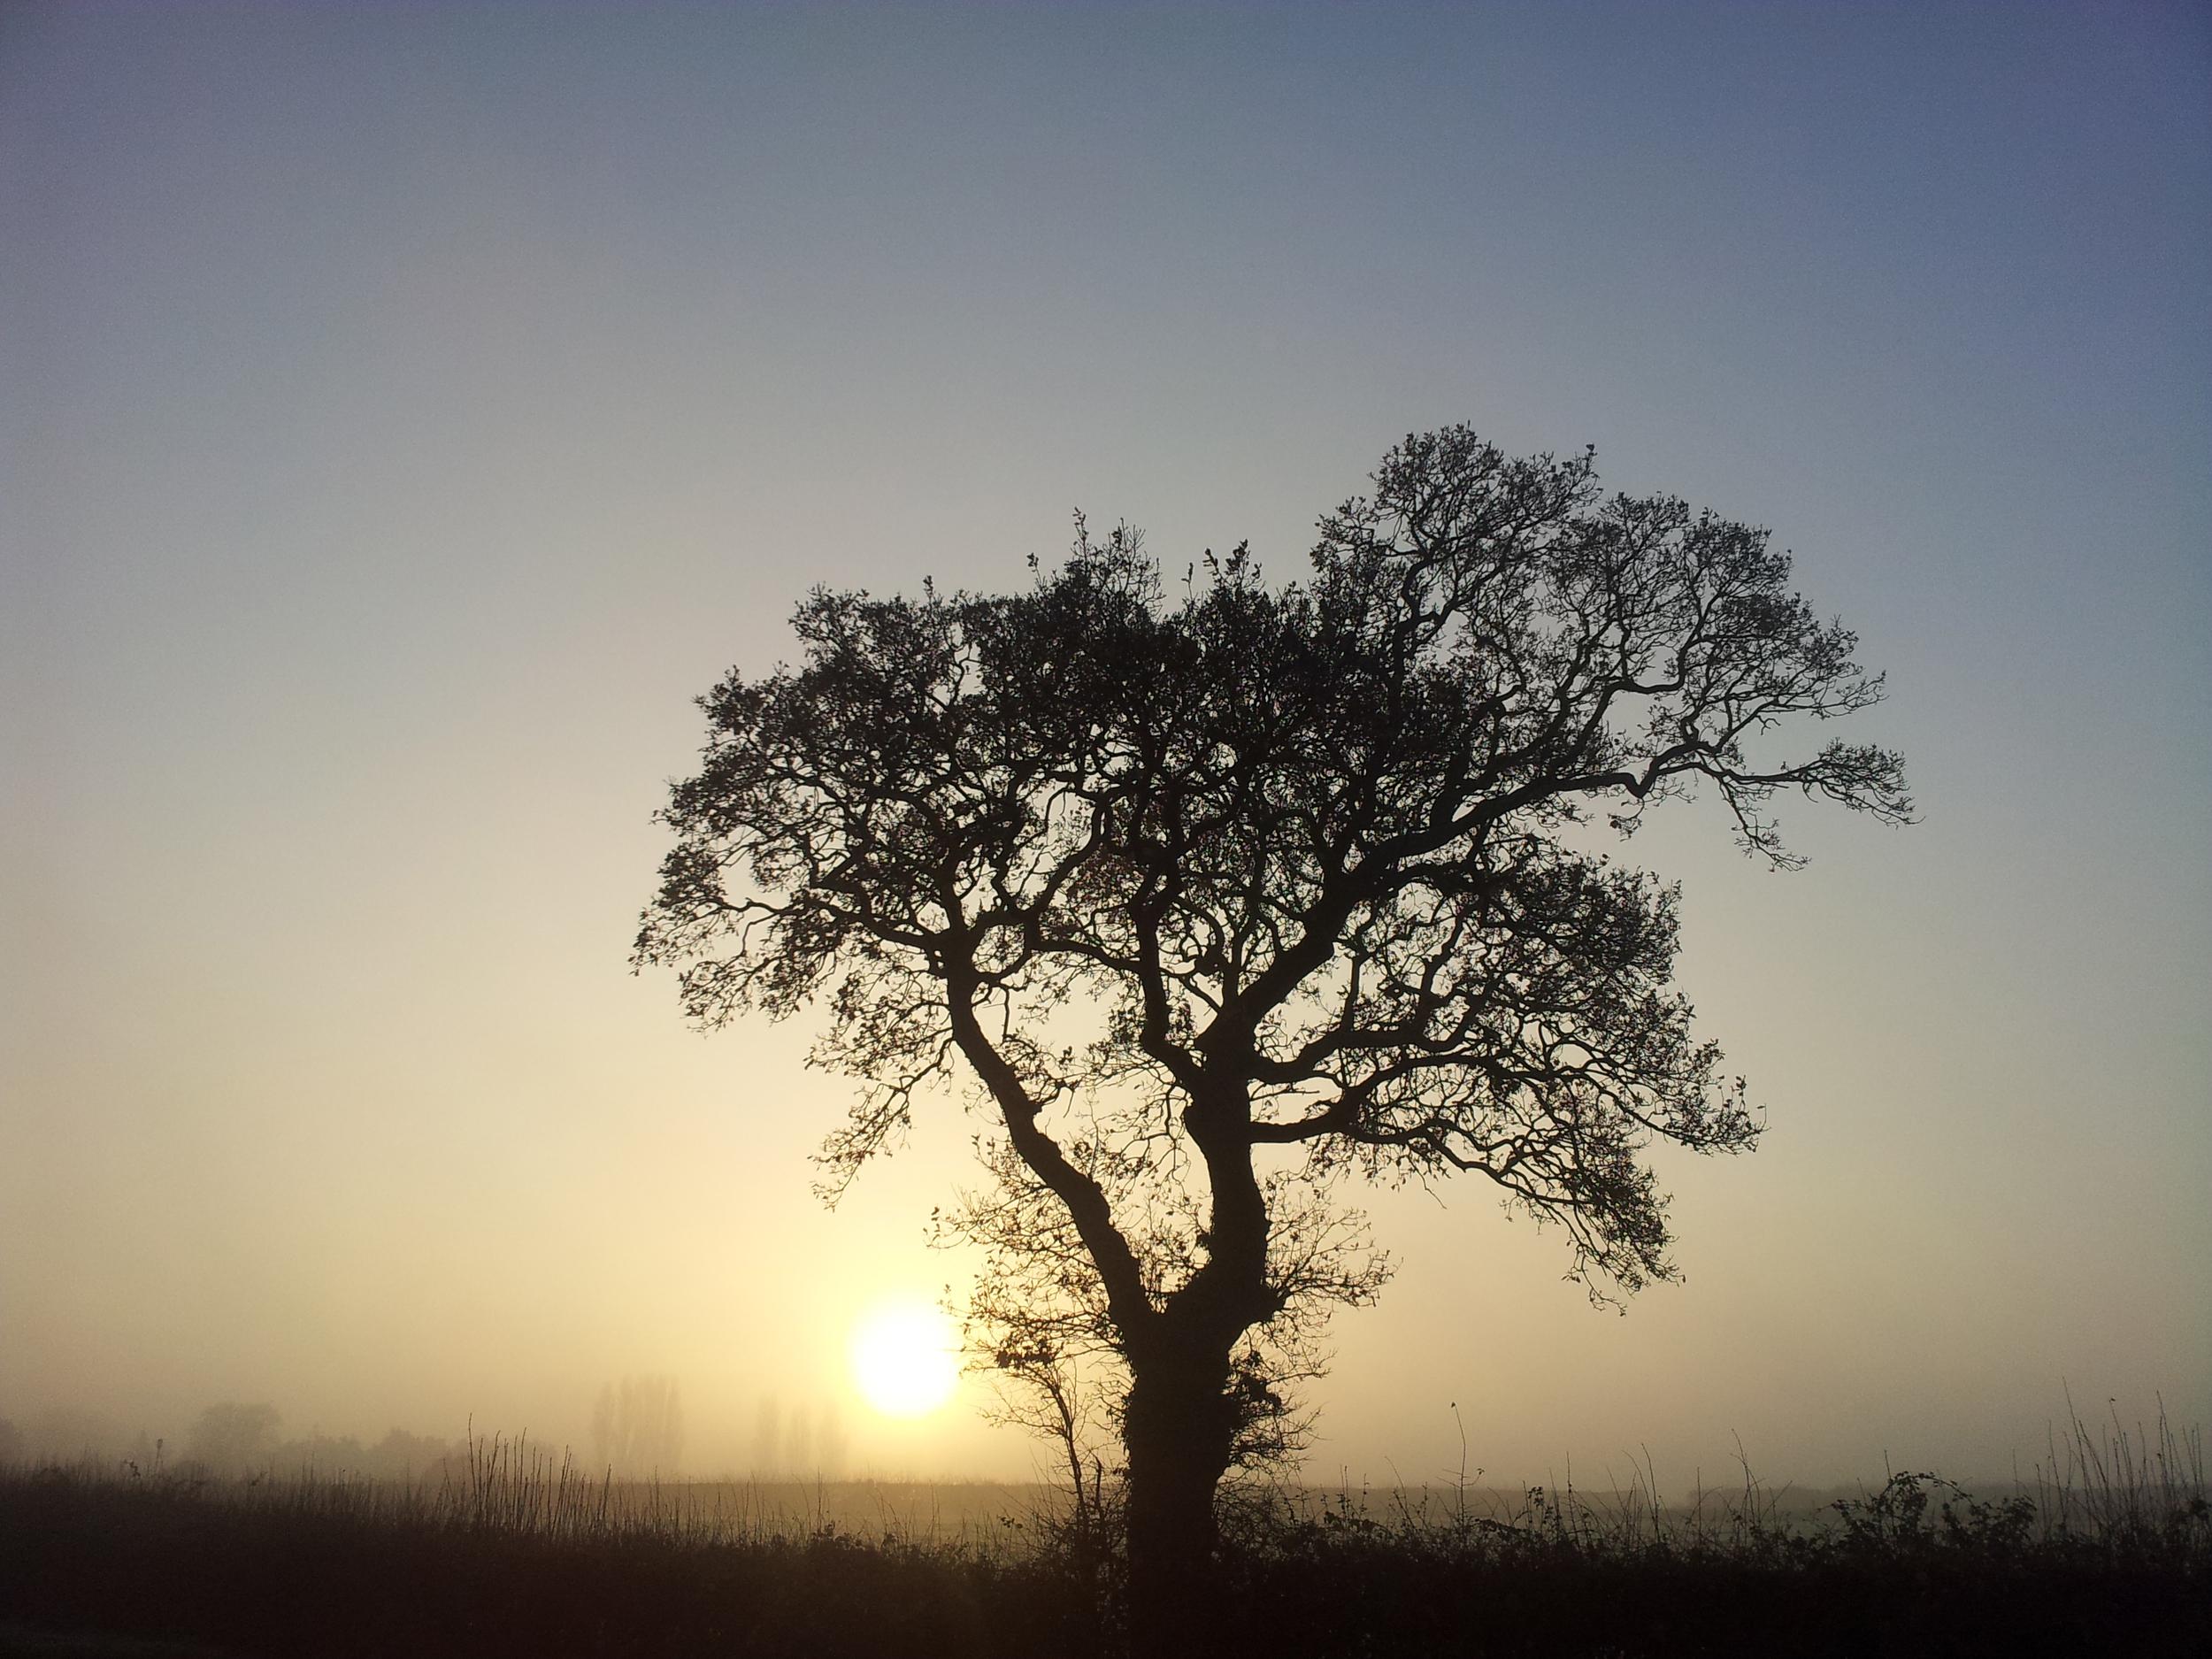 Tree silhouette on a foggy sunrise pastel colours 01.jpg